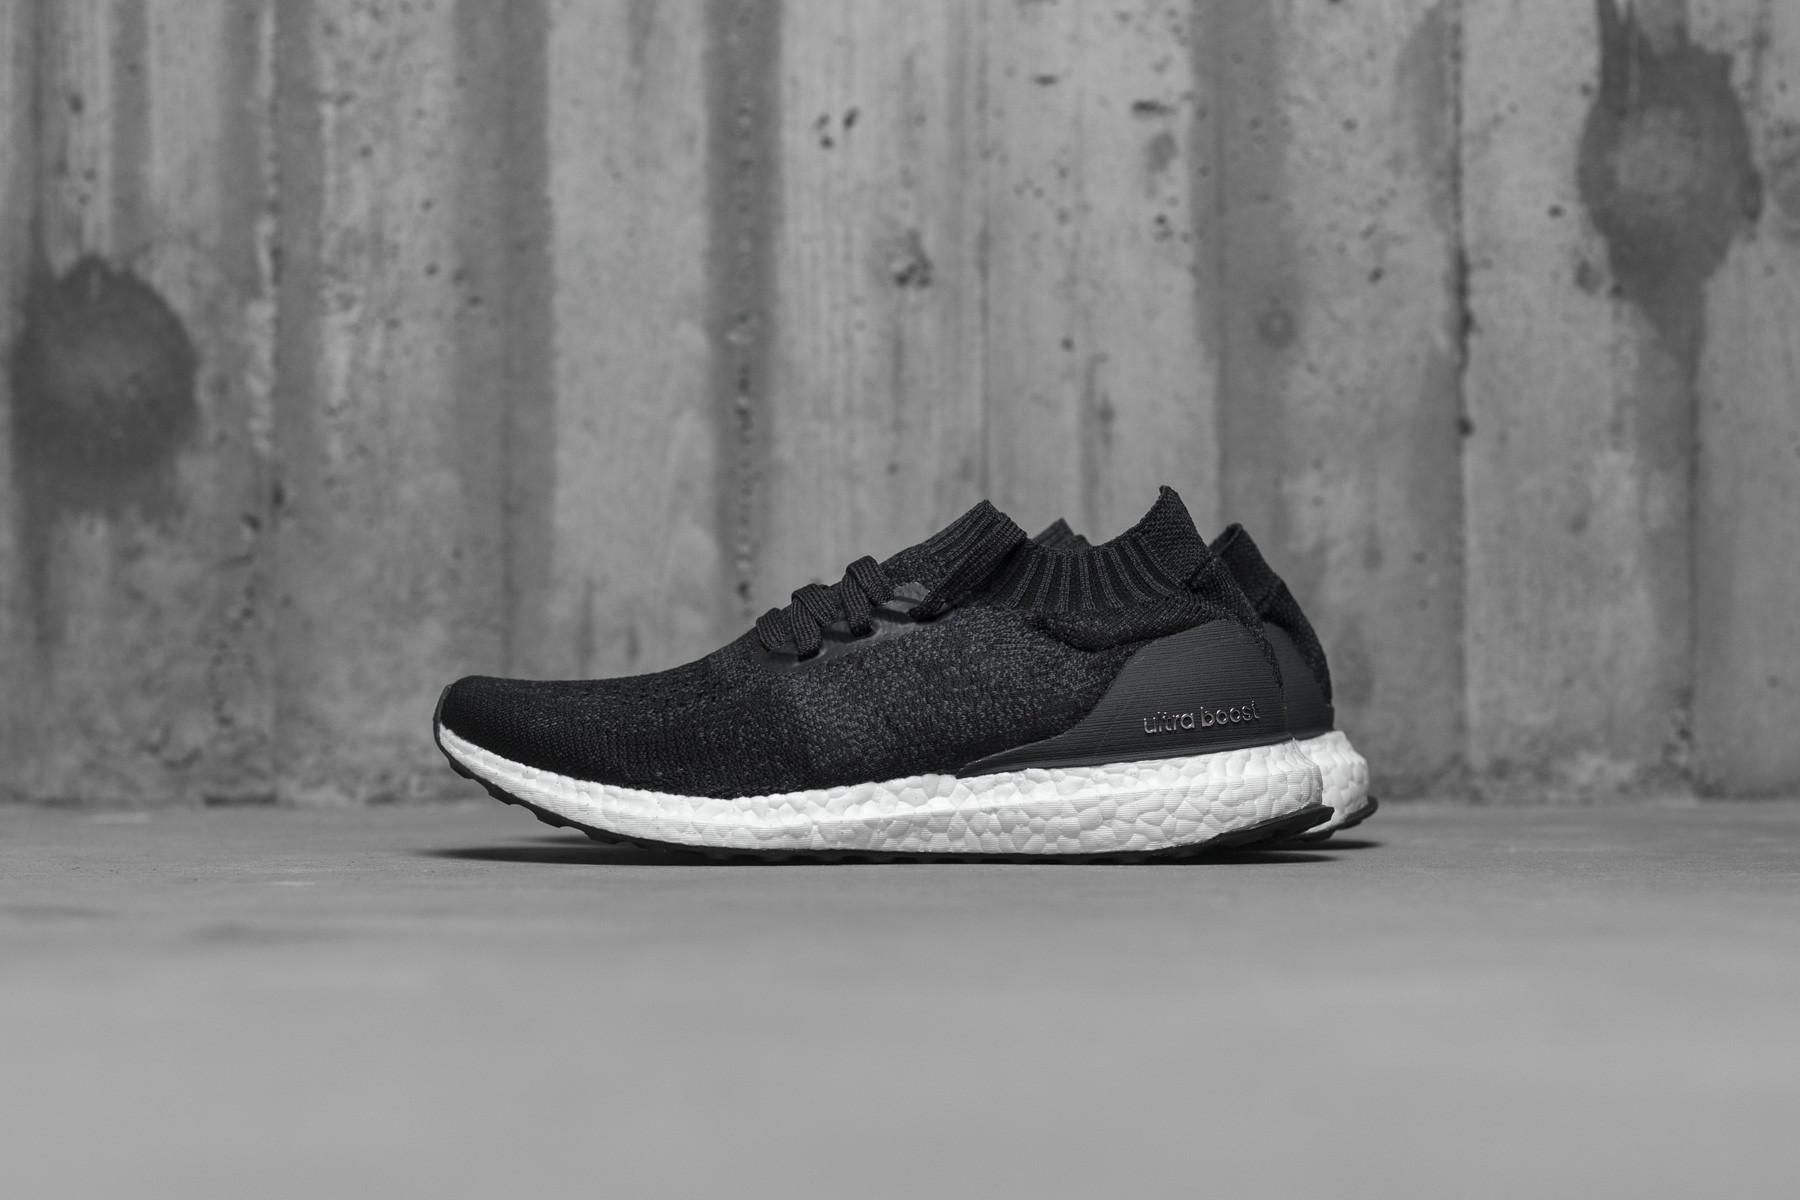 Adidas UltraBOOST Uncaged Sneaker.no